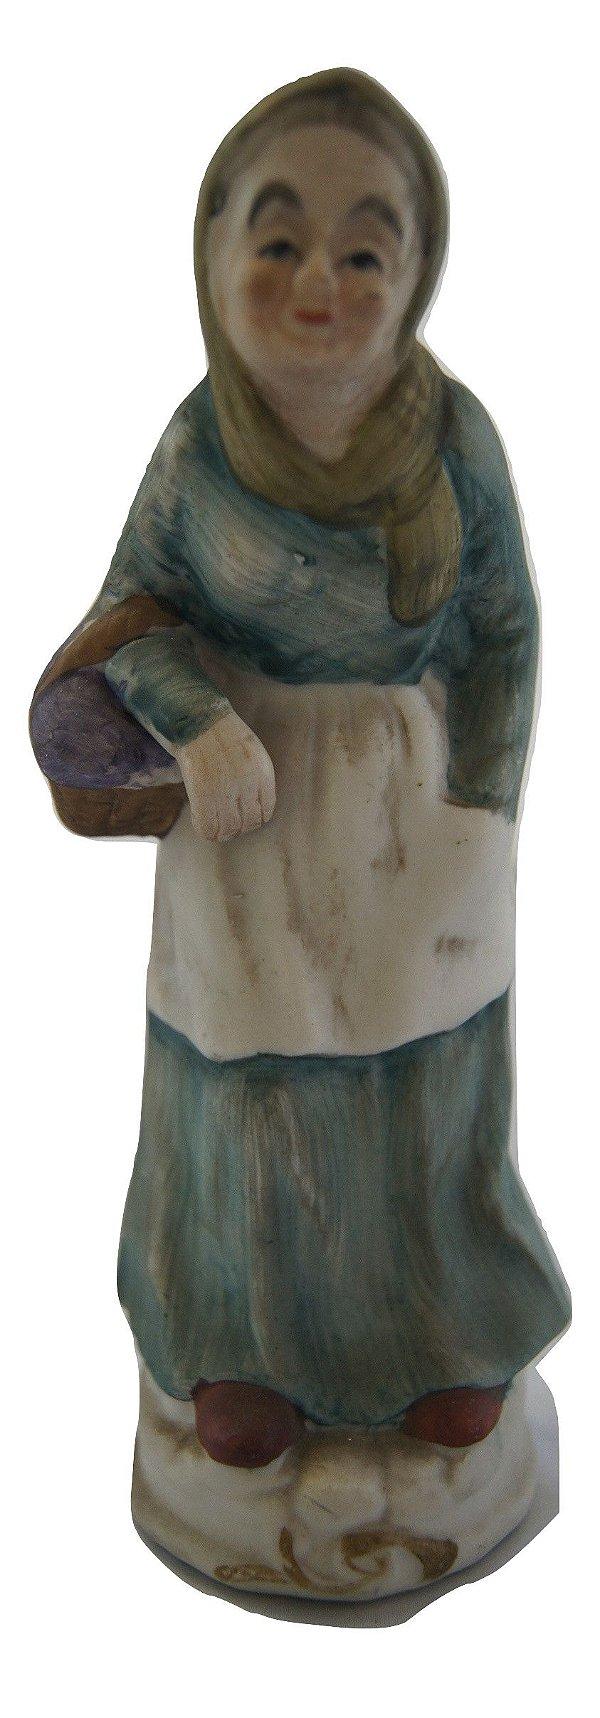 Escultura Estátua Bibelô De Porcelana Mulher Idosa